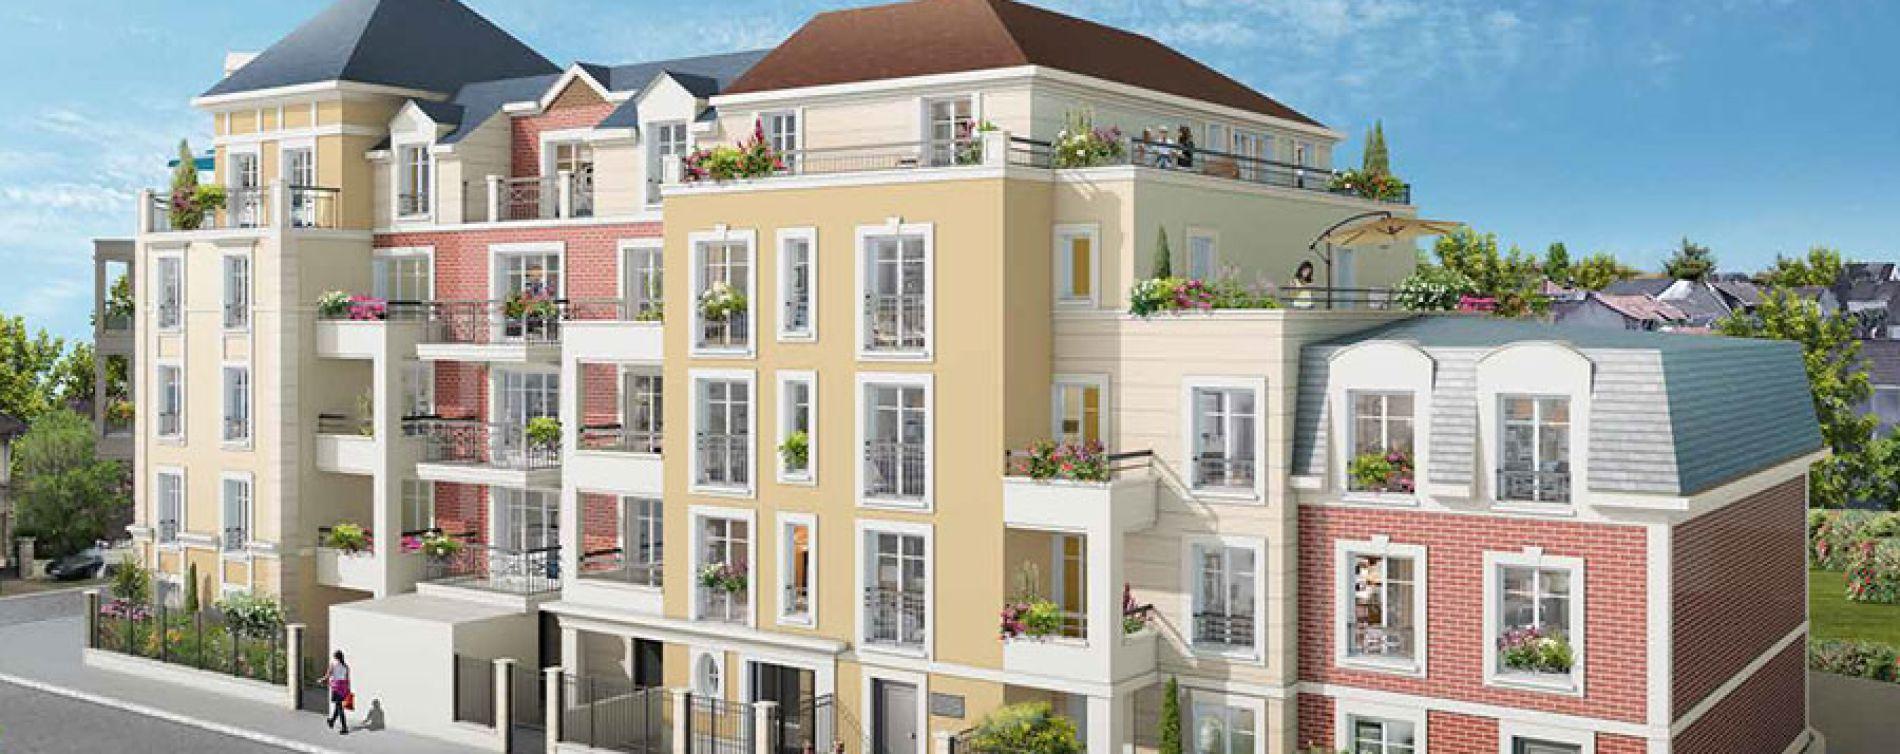 Résidence Villa de Traversay au Blanc-Mesnil